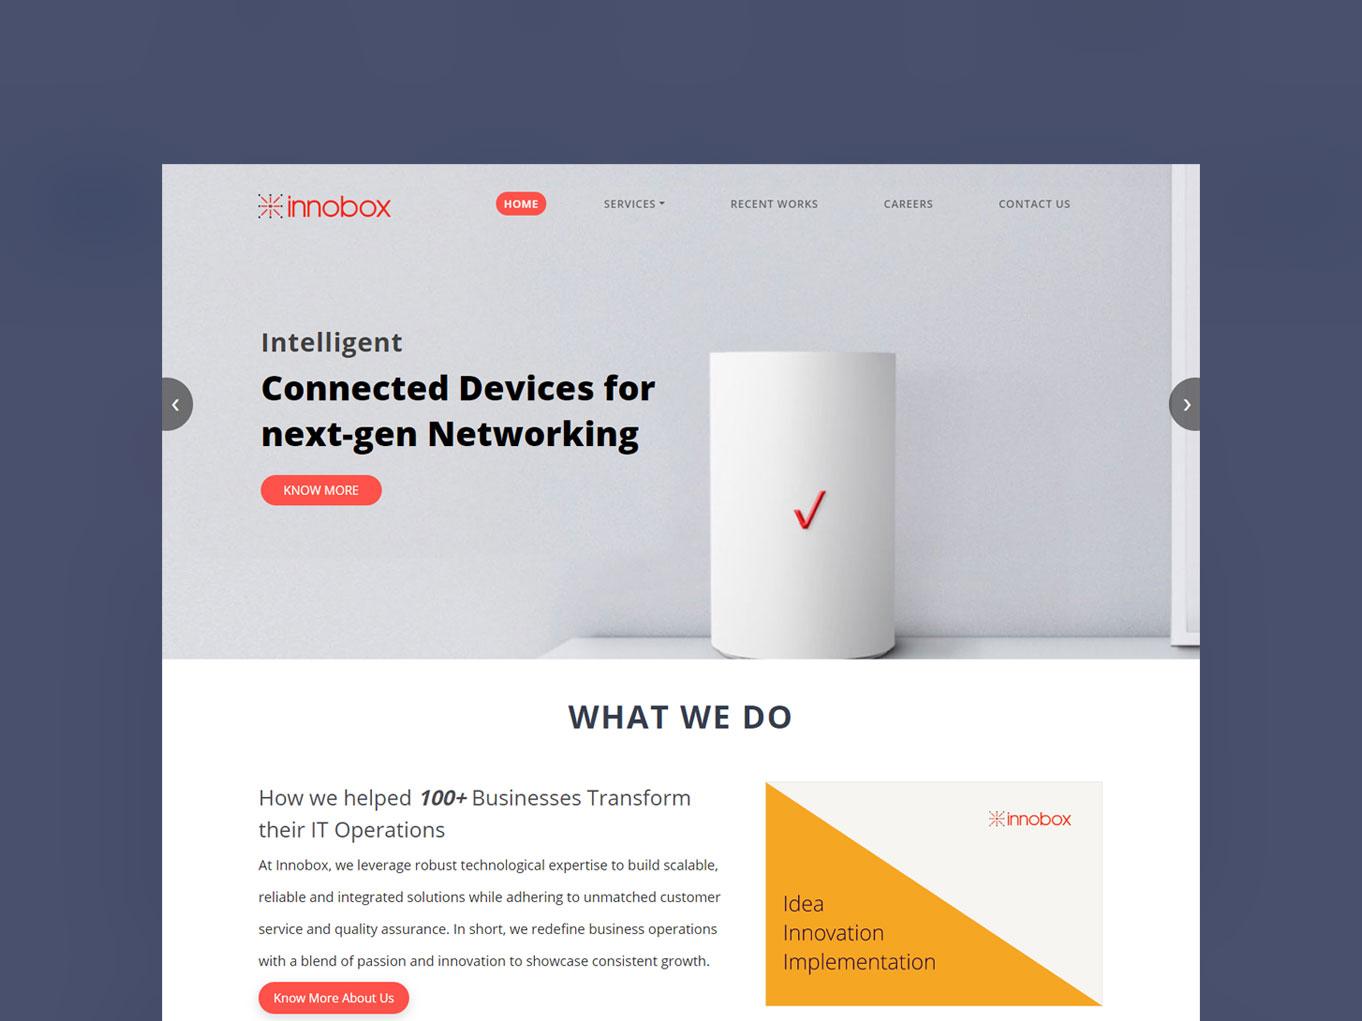 innobox intelligent connect devices next generation networking design indian ui ux design app design best ui ux solution design work networking next generation connect devices intelligent innobox